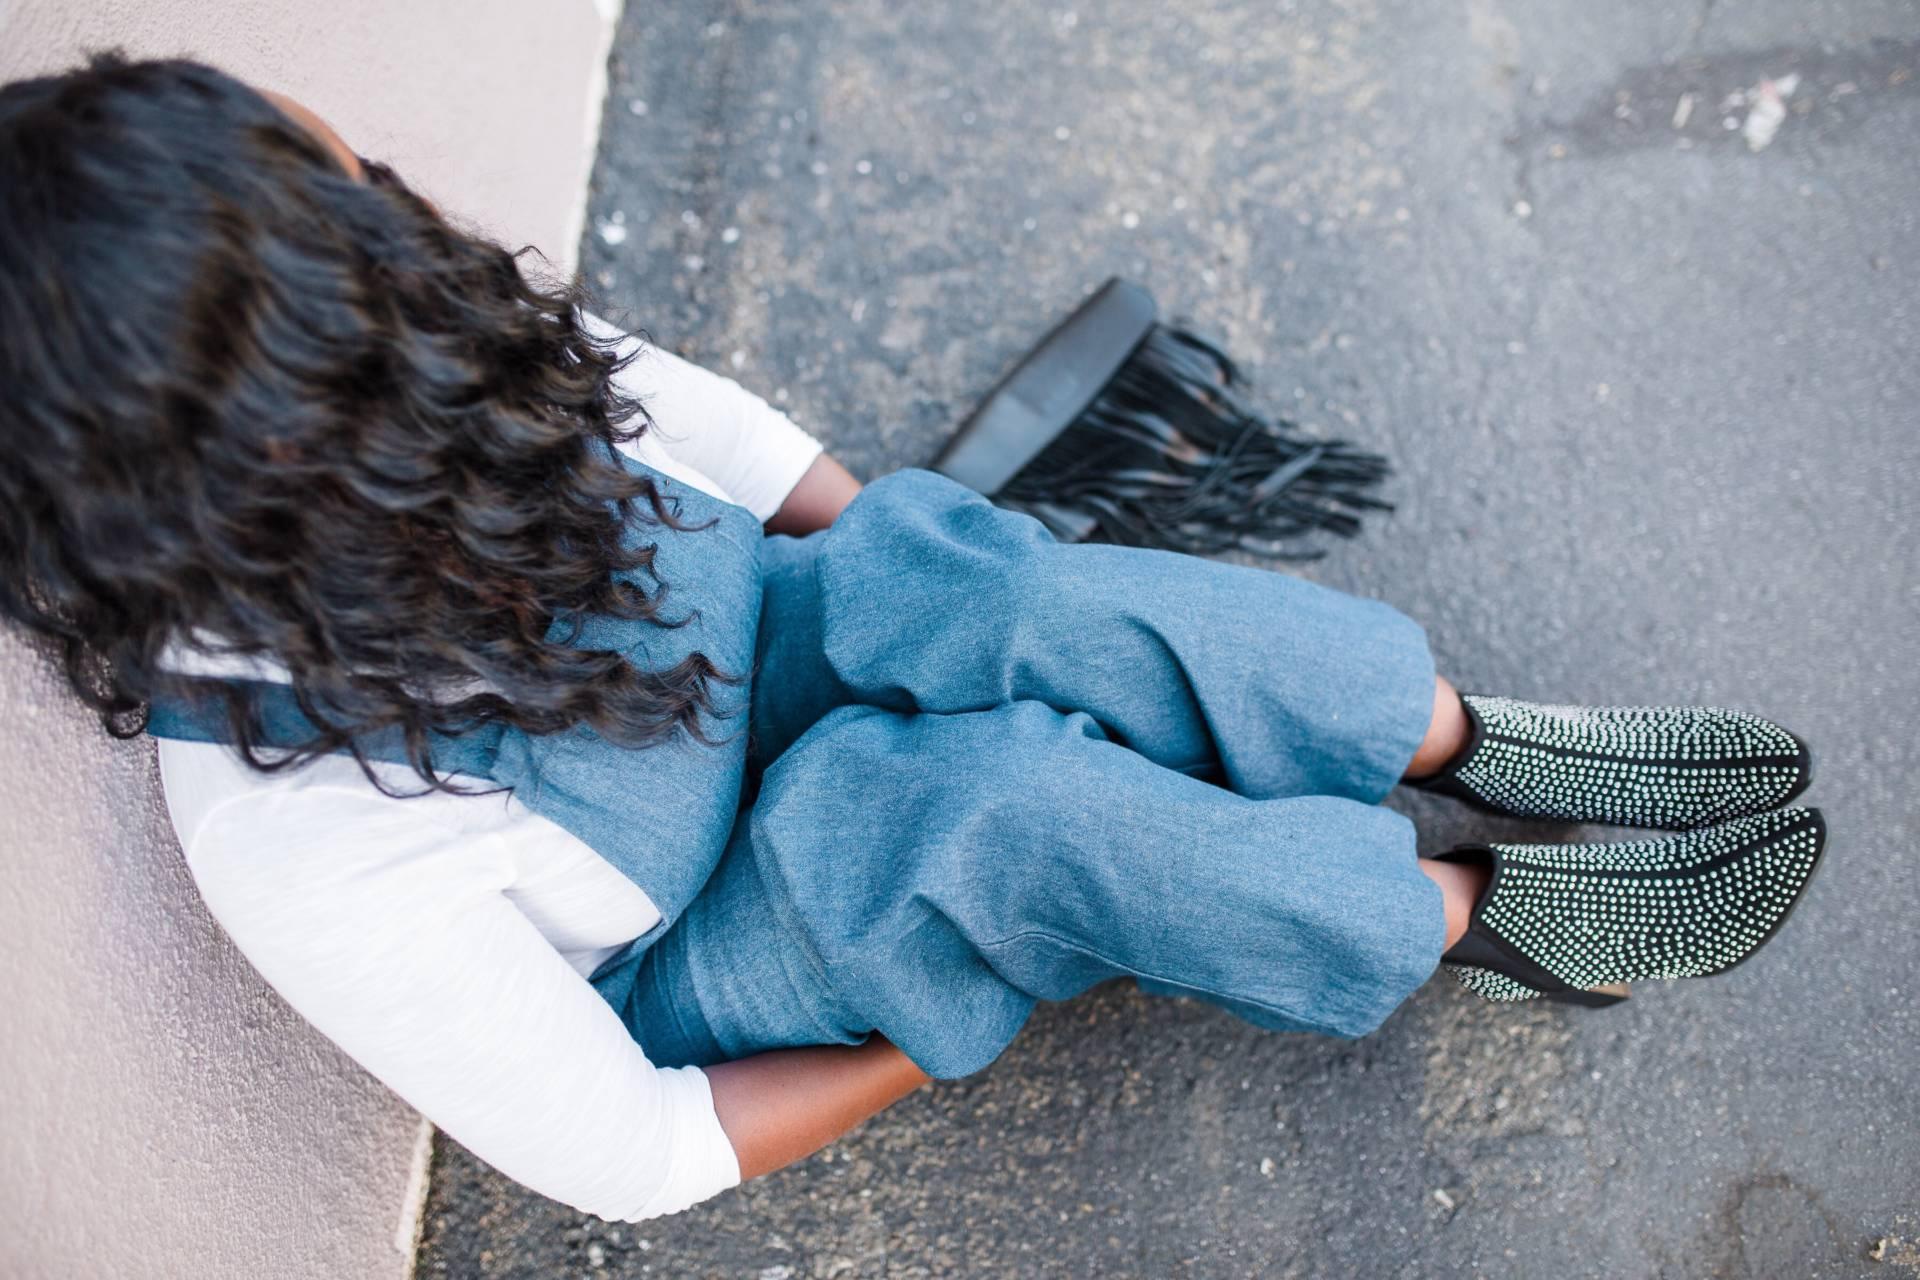 overalls-fashion- sitting